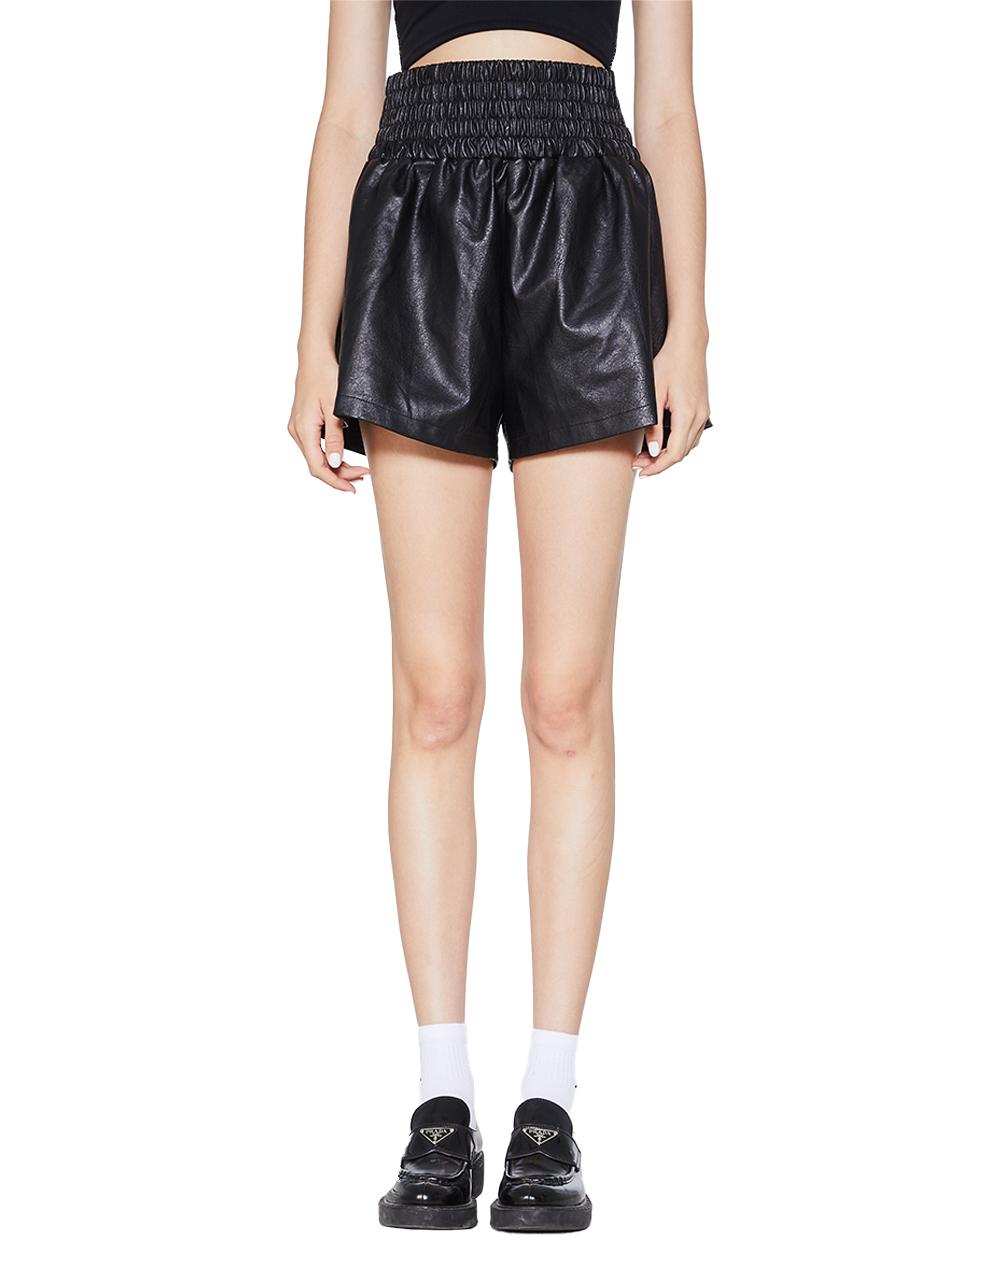 Yoko Leather Short-YUYU